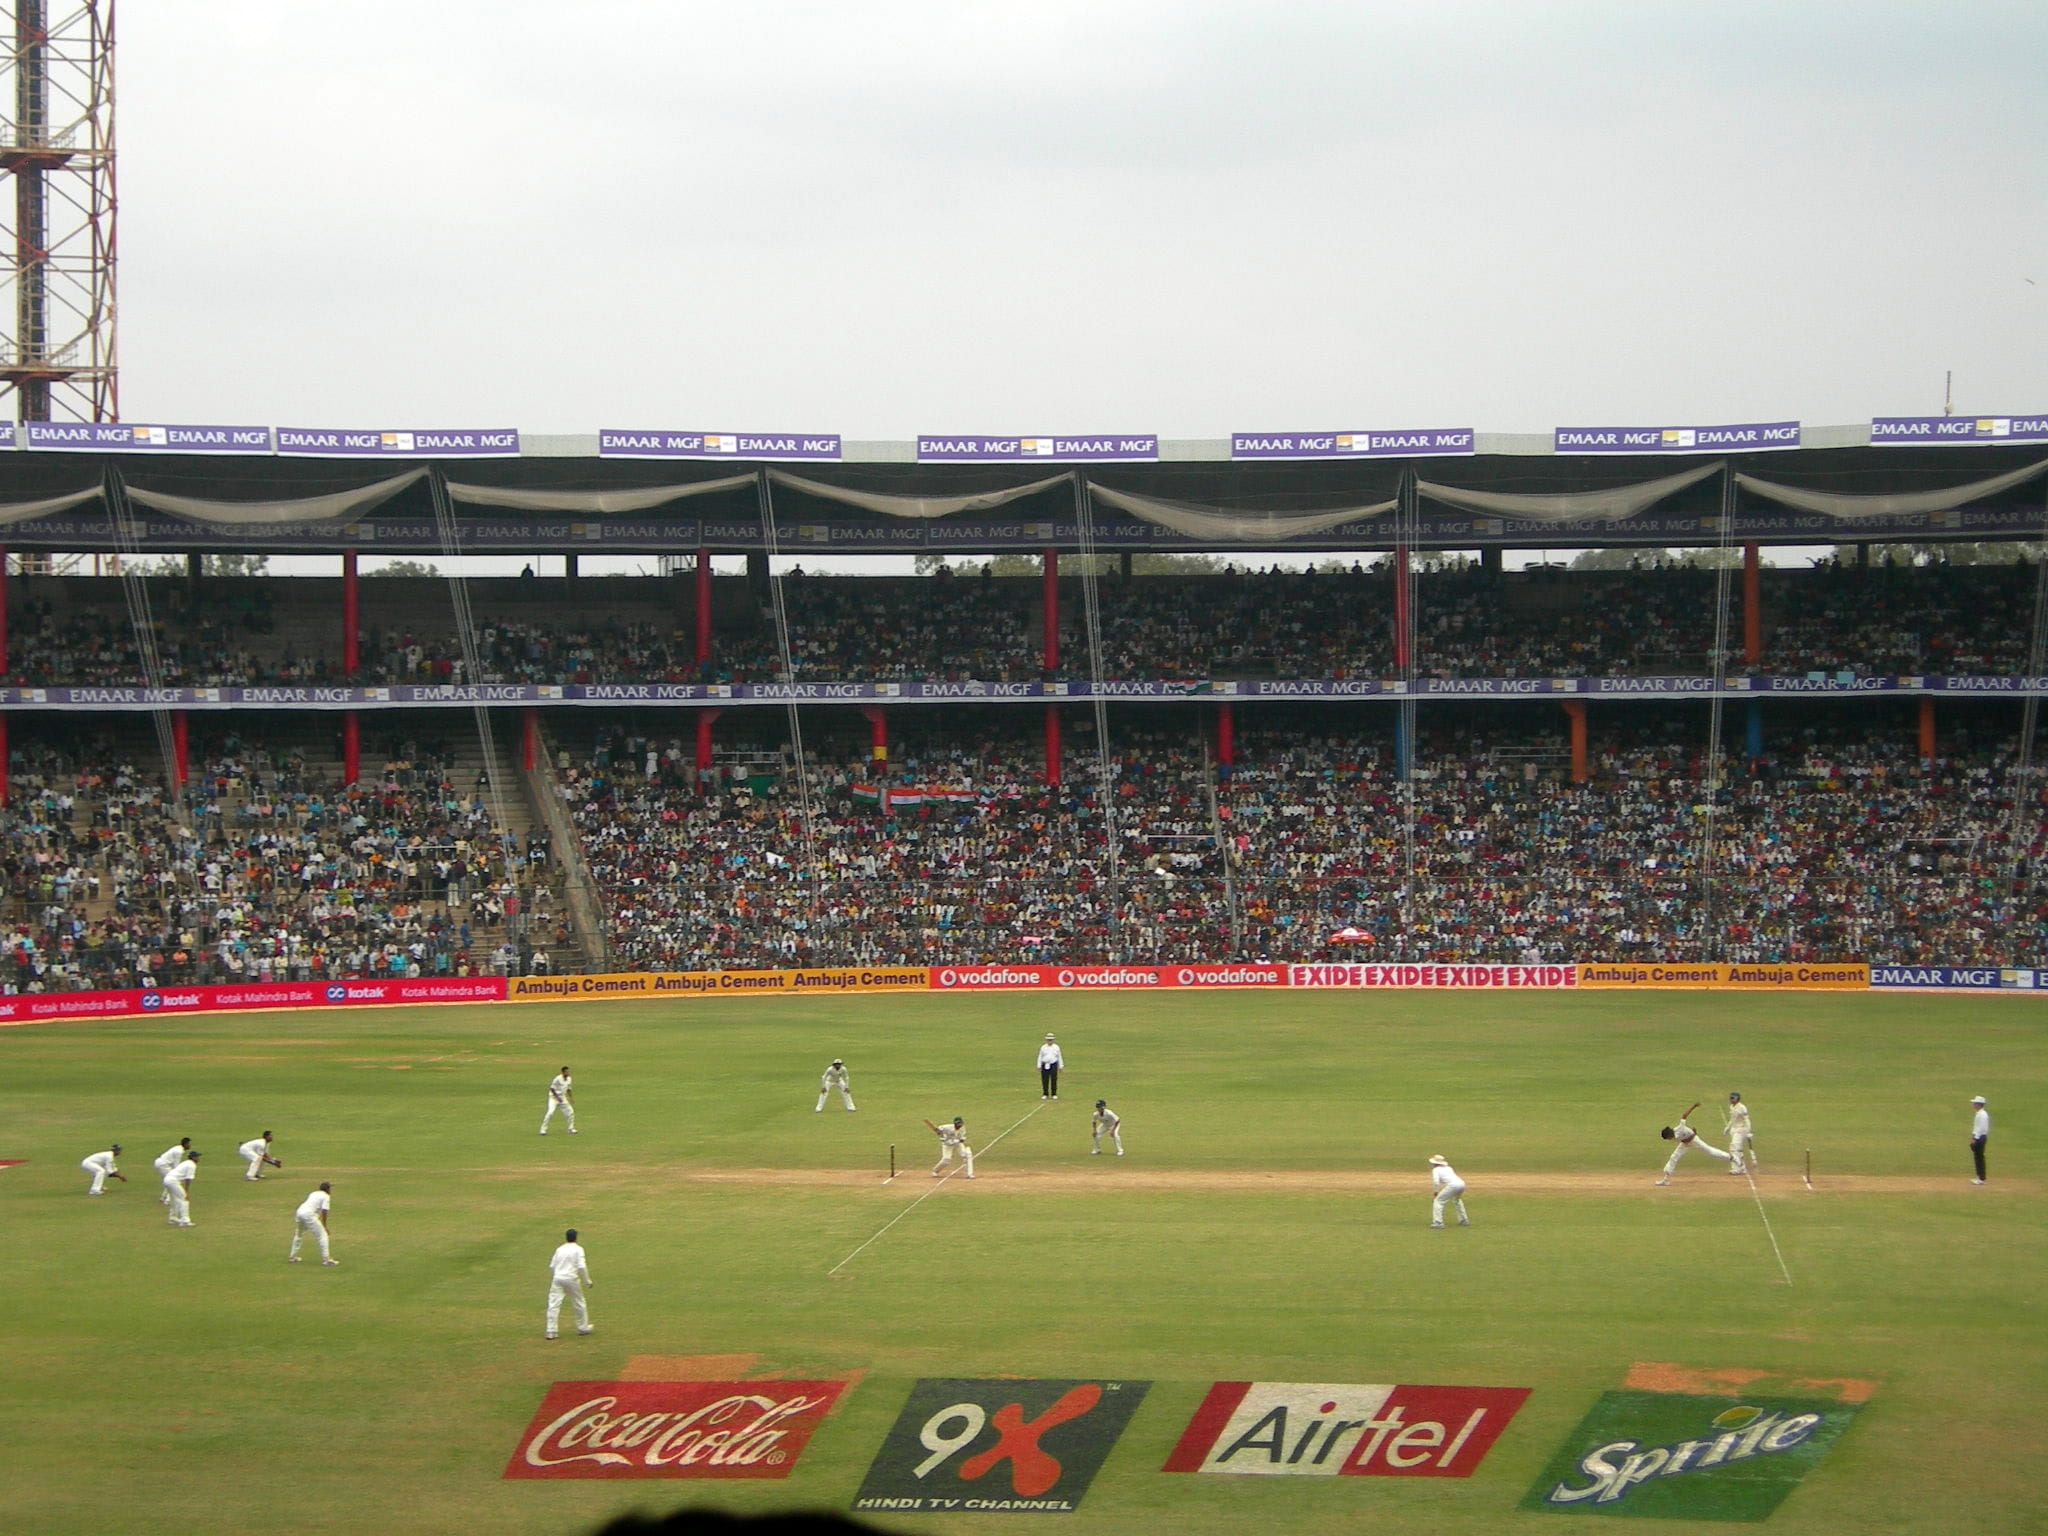 First Cricket Test at Bengaluru